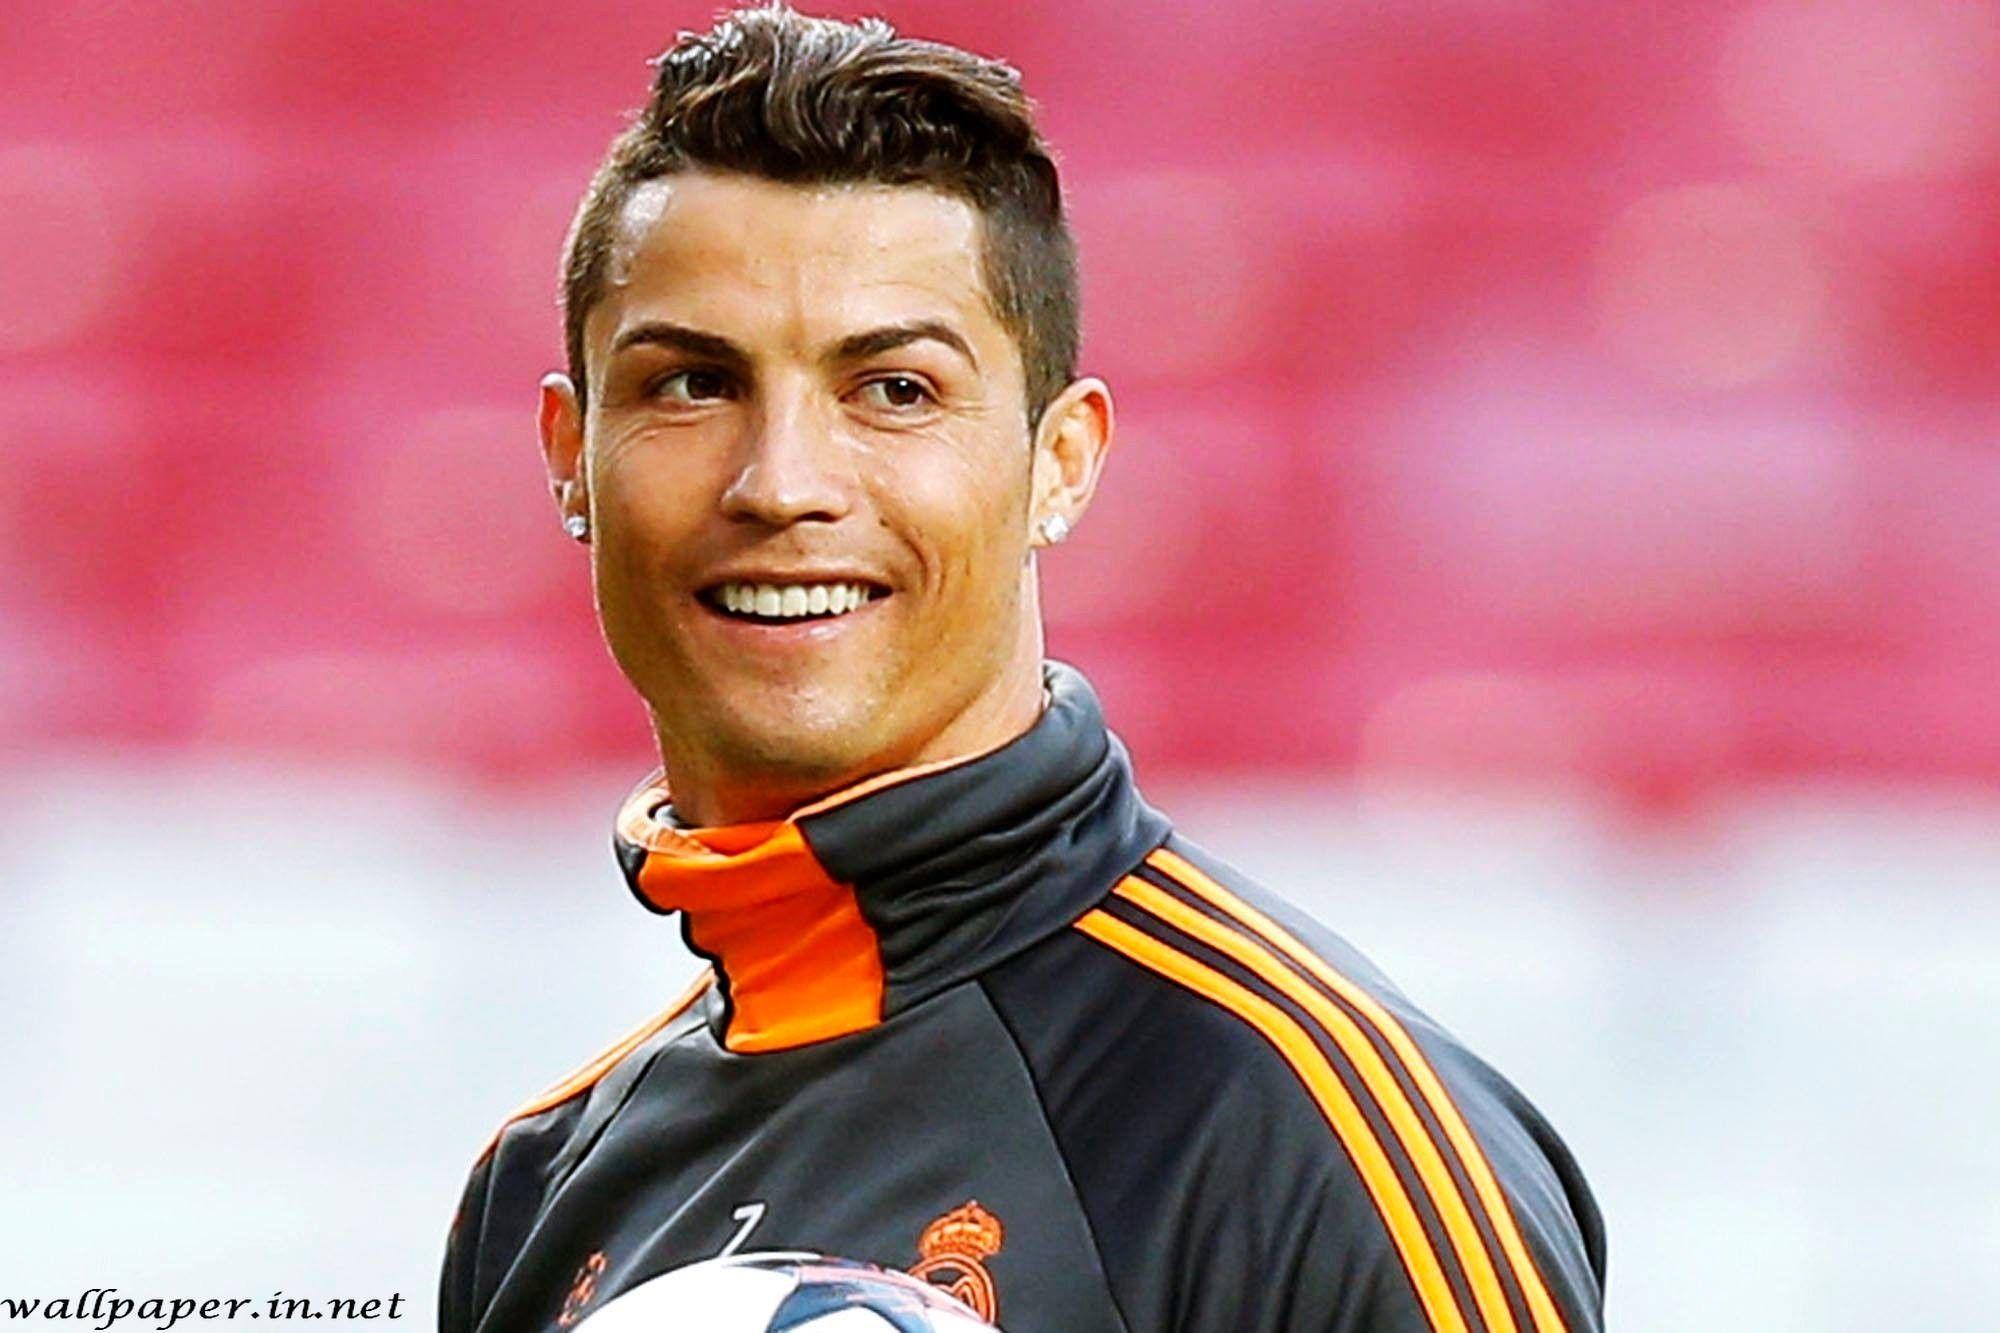 2000x1333 Cristiano Ronaldo Hình nền HD